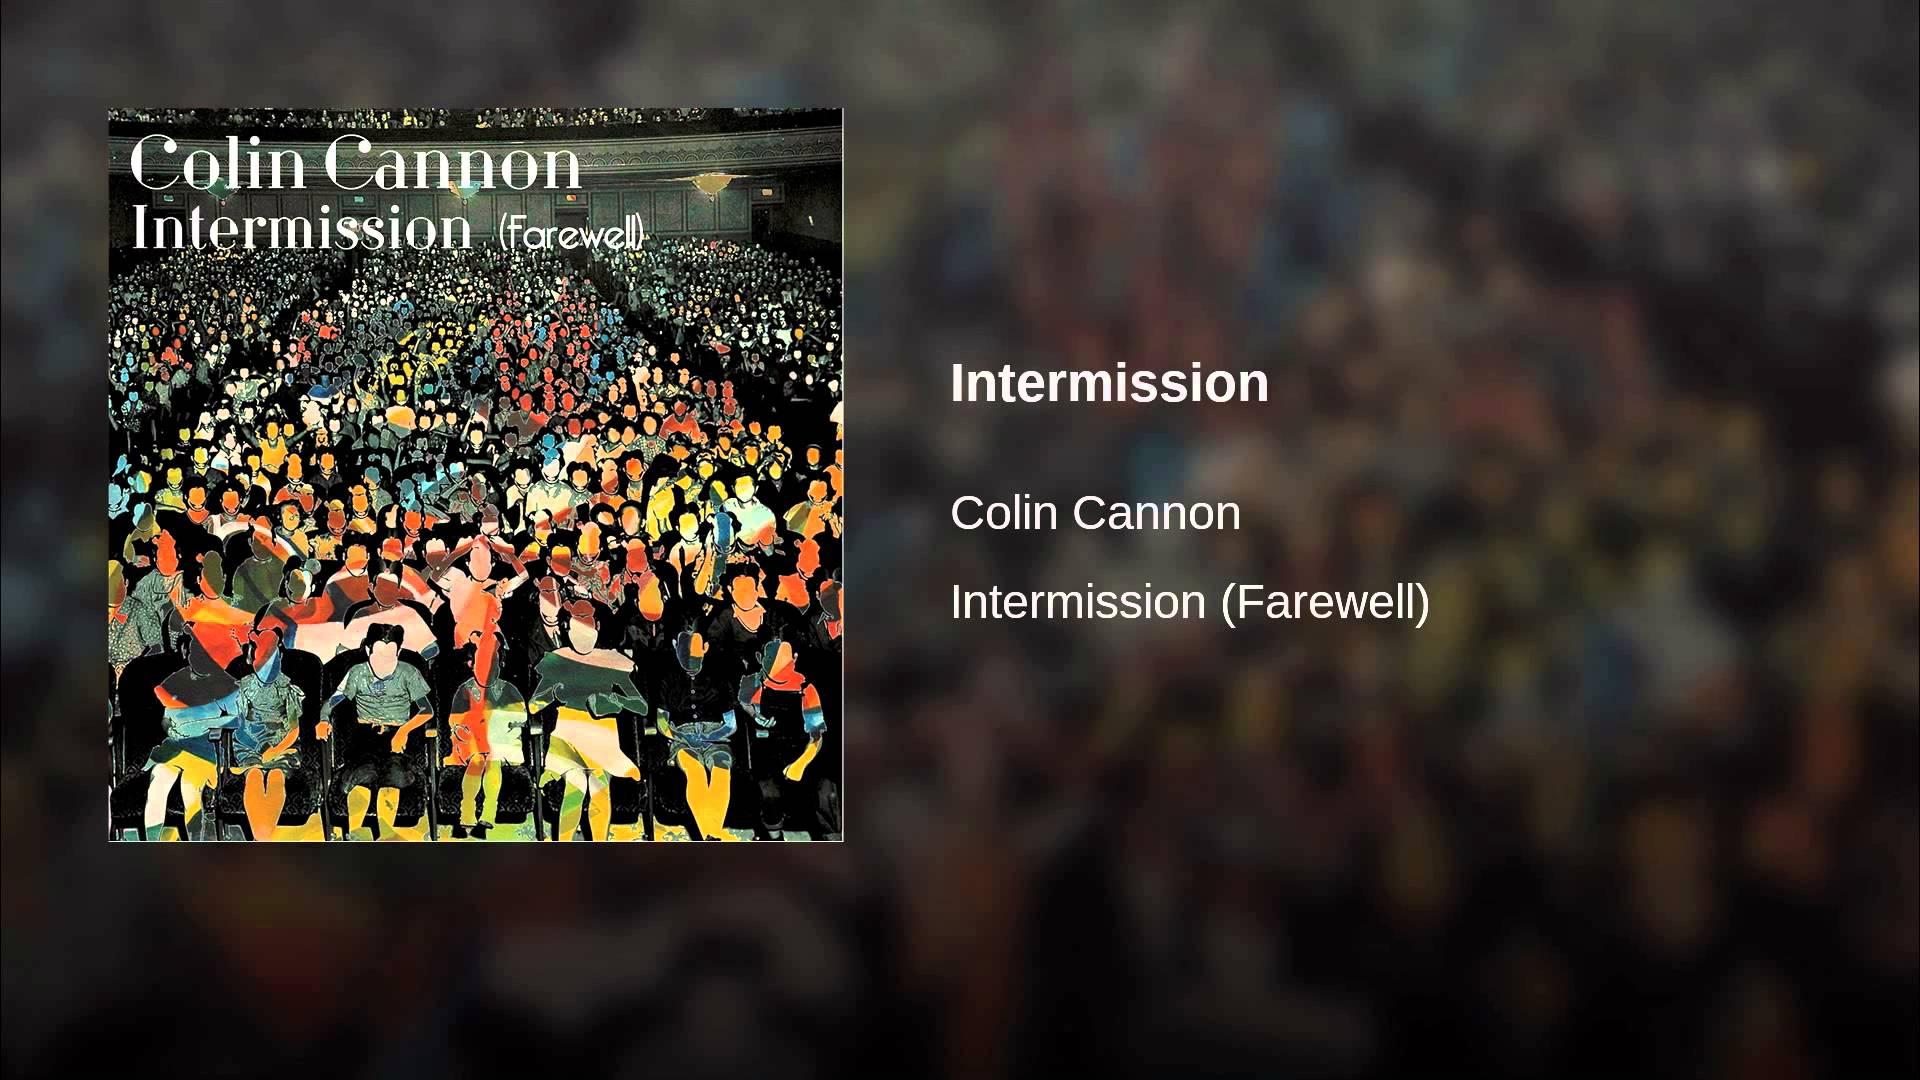 Colin Cannon's new 'Intermission' follows no jazz trend